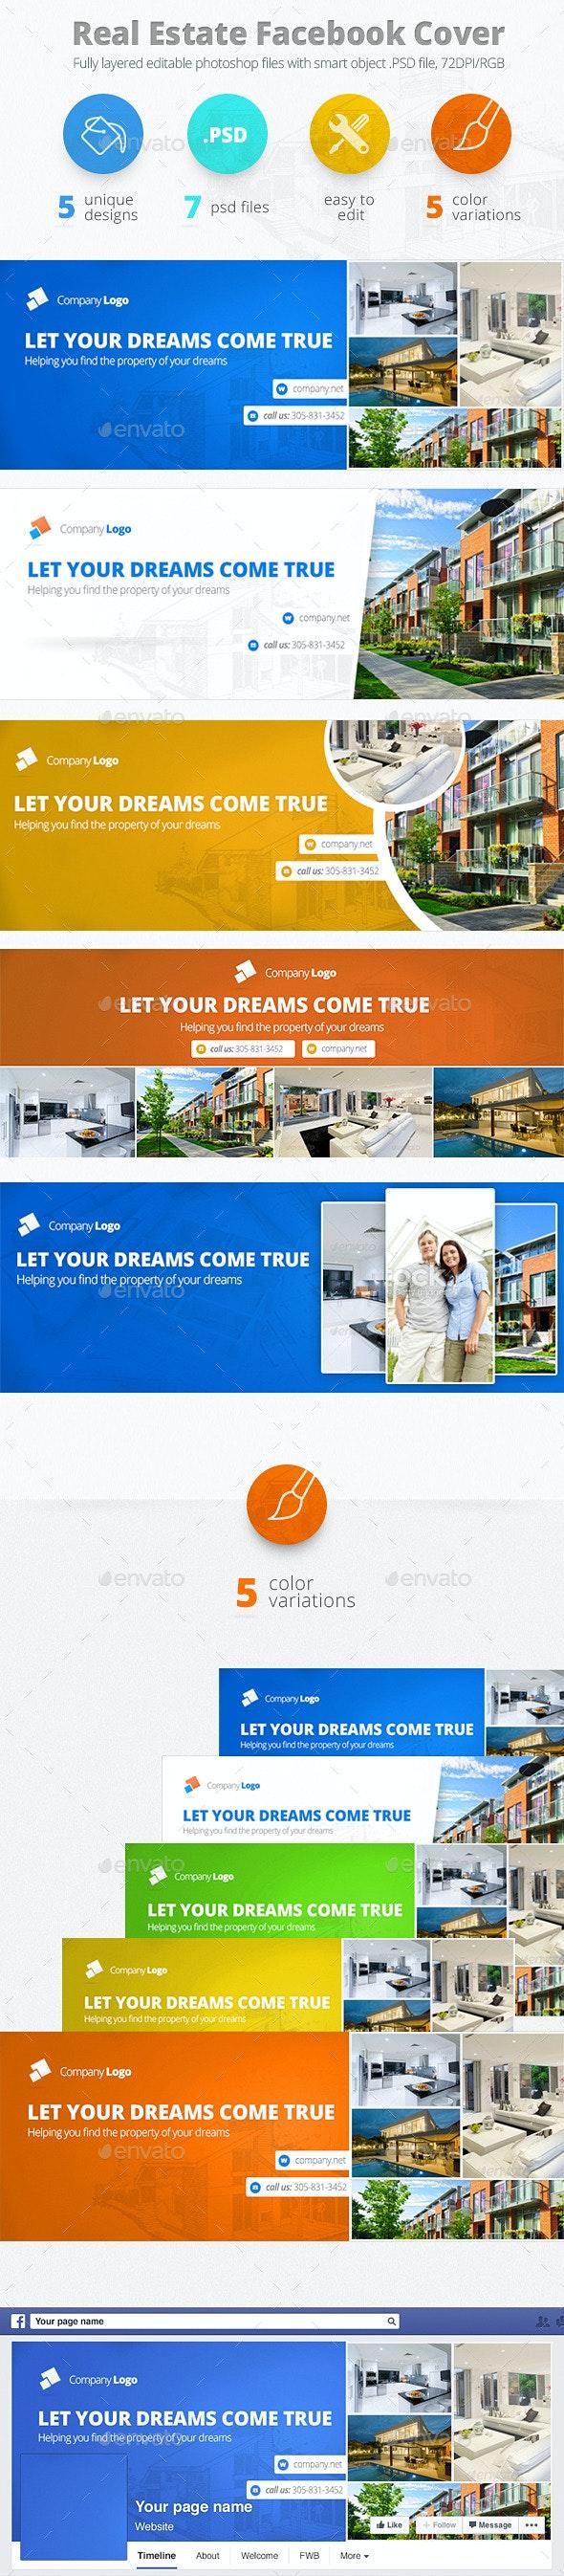 Real Estate Facebook Cover  - Facebook Timeline Covers Social Media